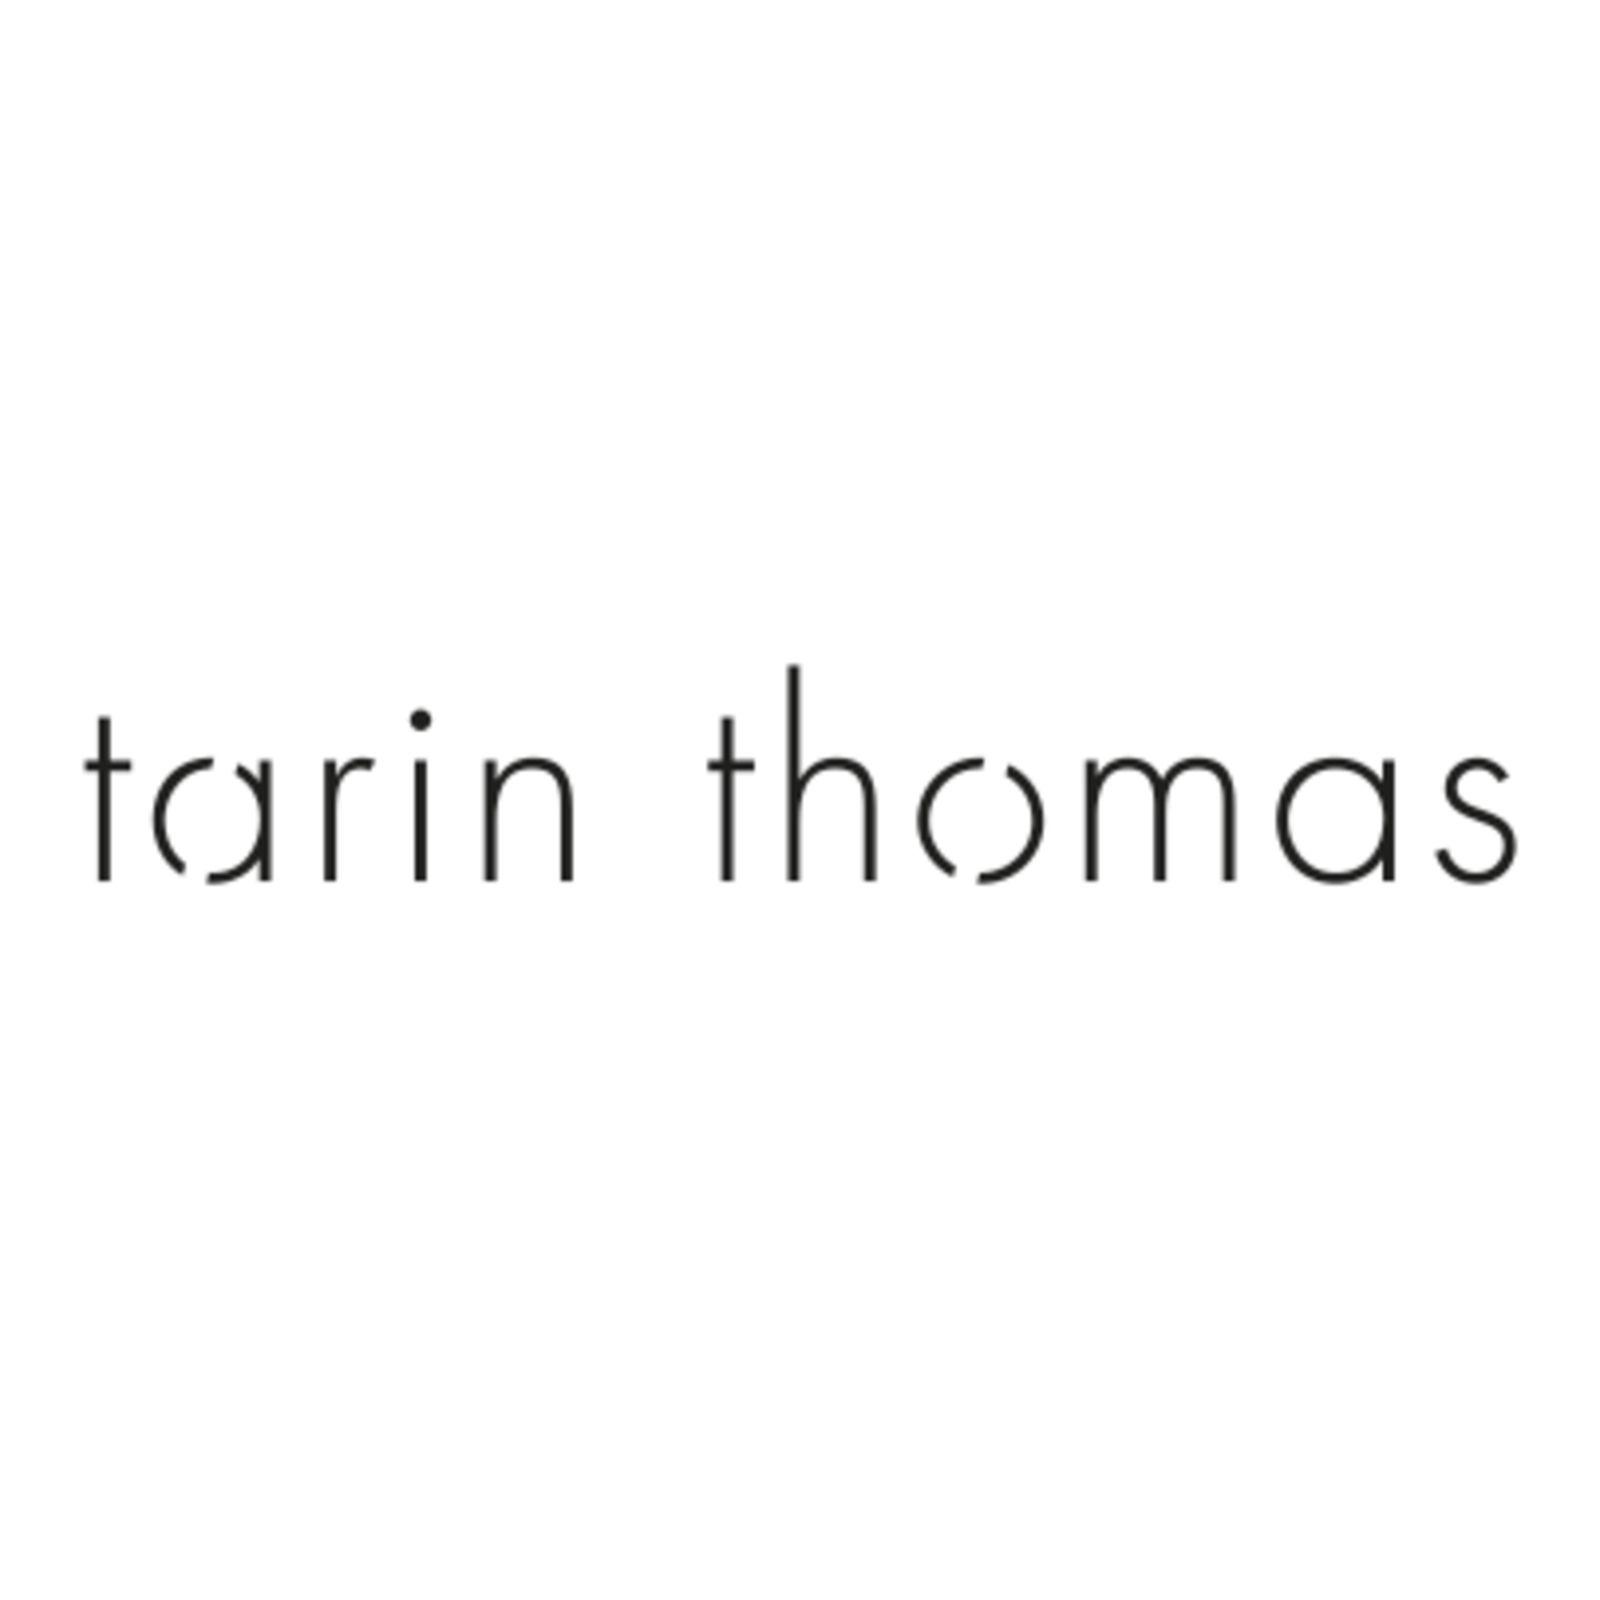 tarin thomas